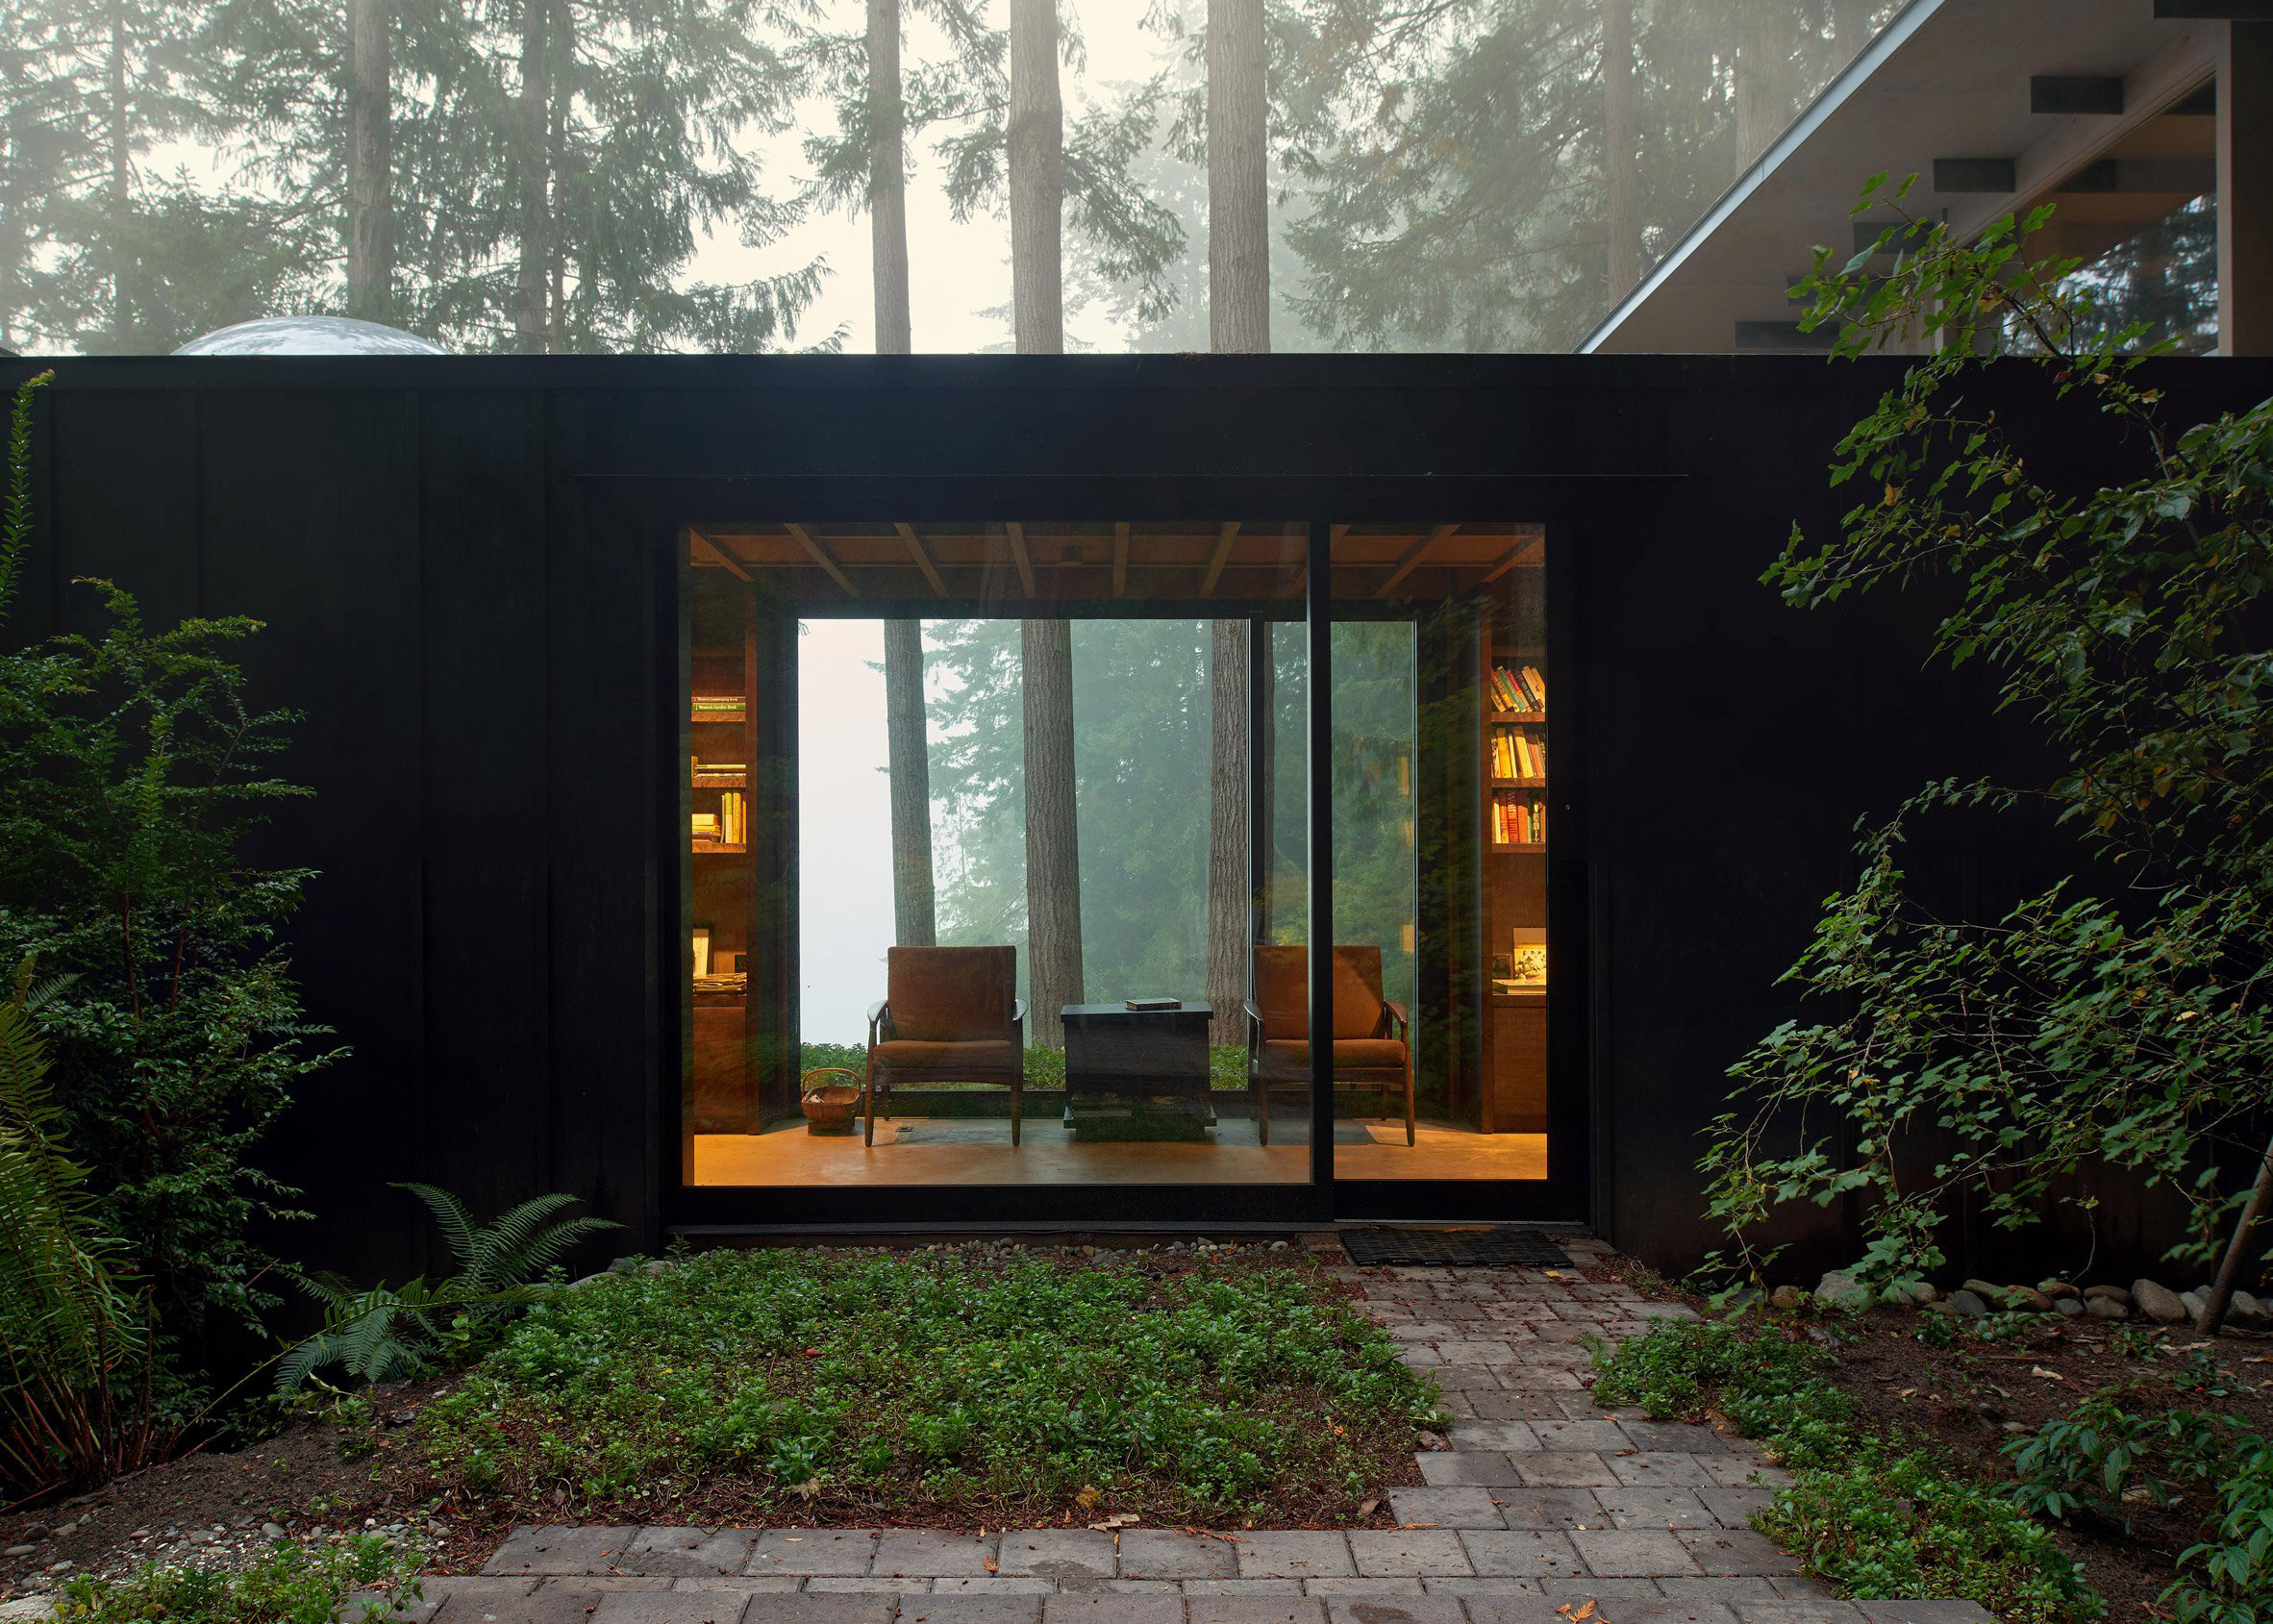 Olson Cabin, Washington, by Jim Olson